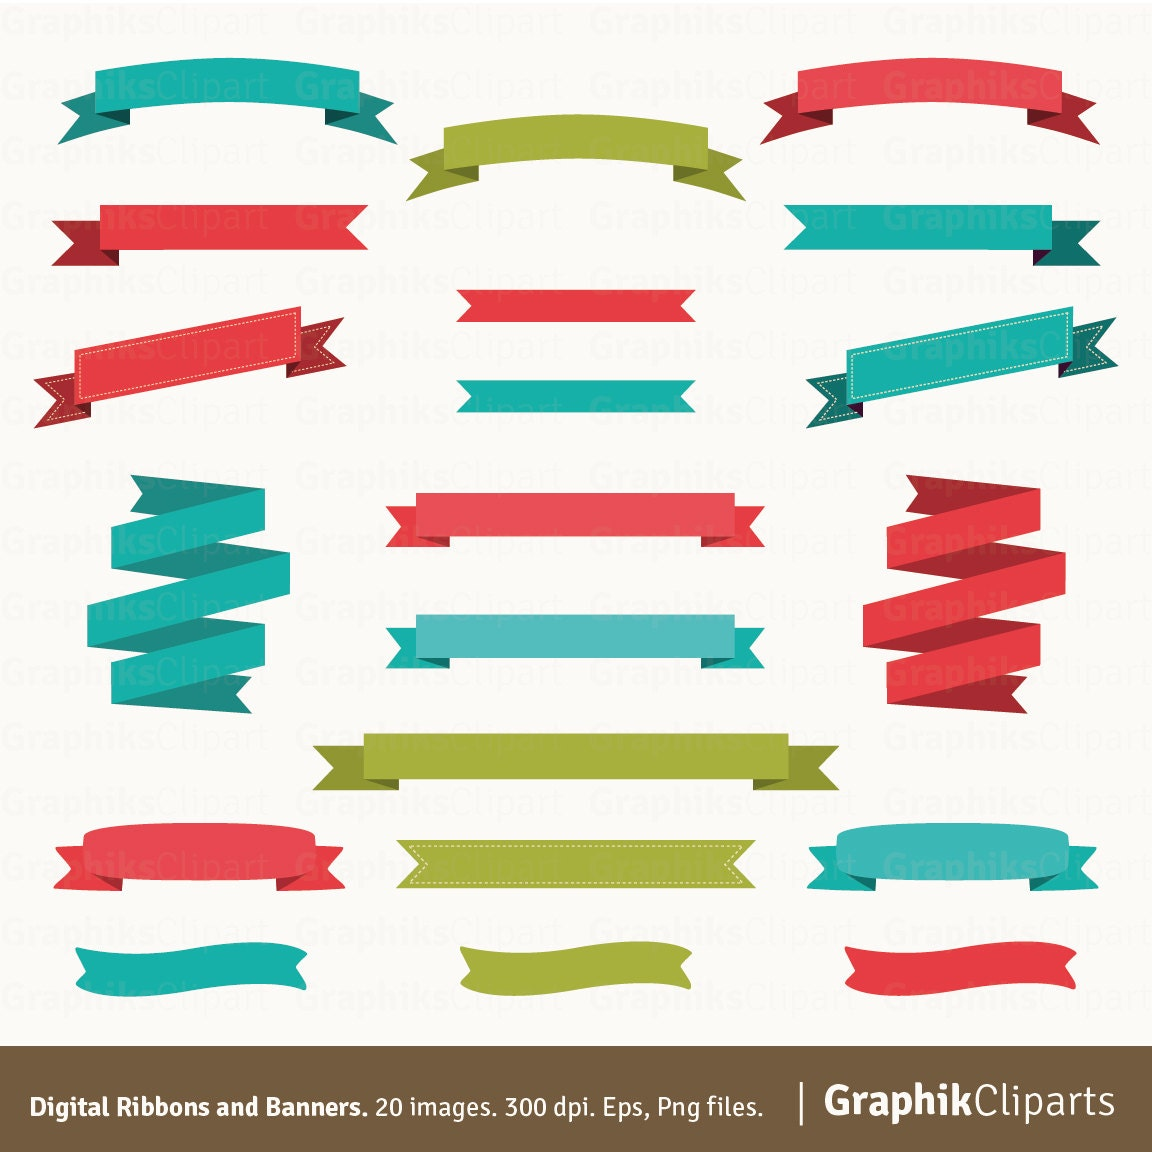 digital ribbons banners clipart vector ribbons and vector rh etsy com vector ribbon banner illustrator vector ribbon banner template